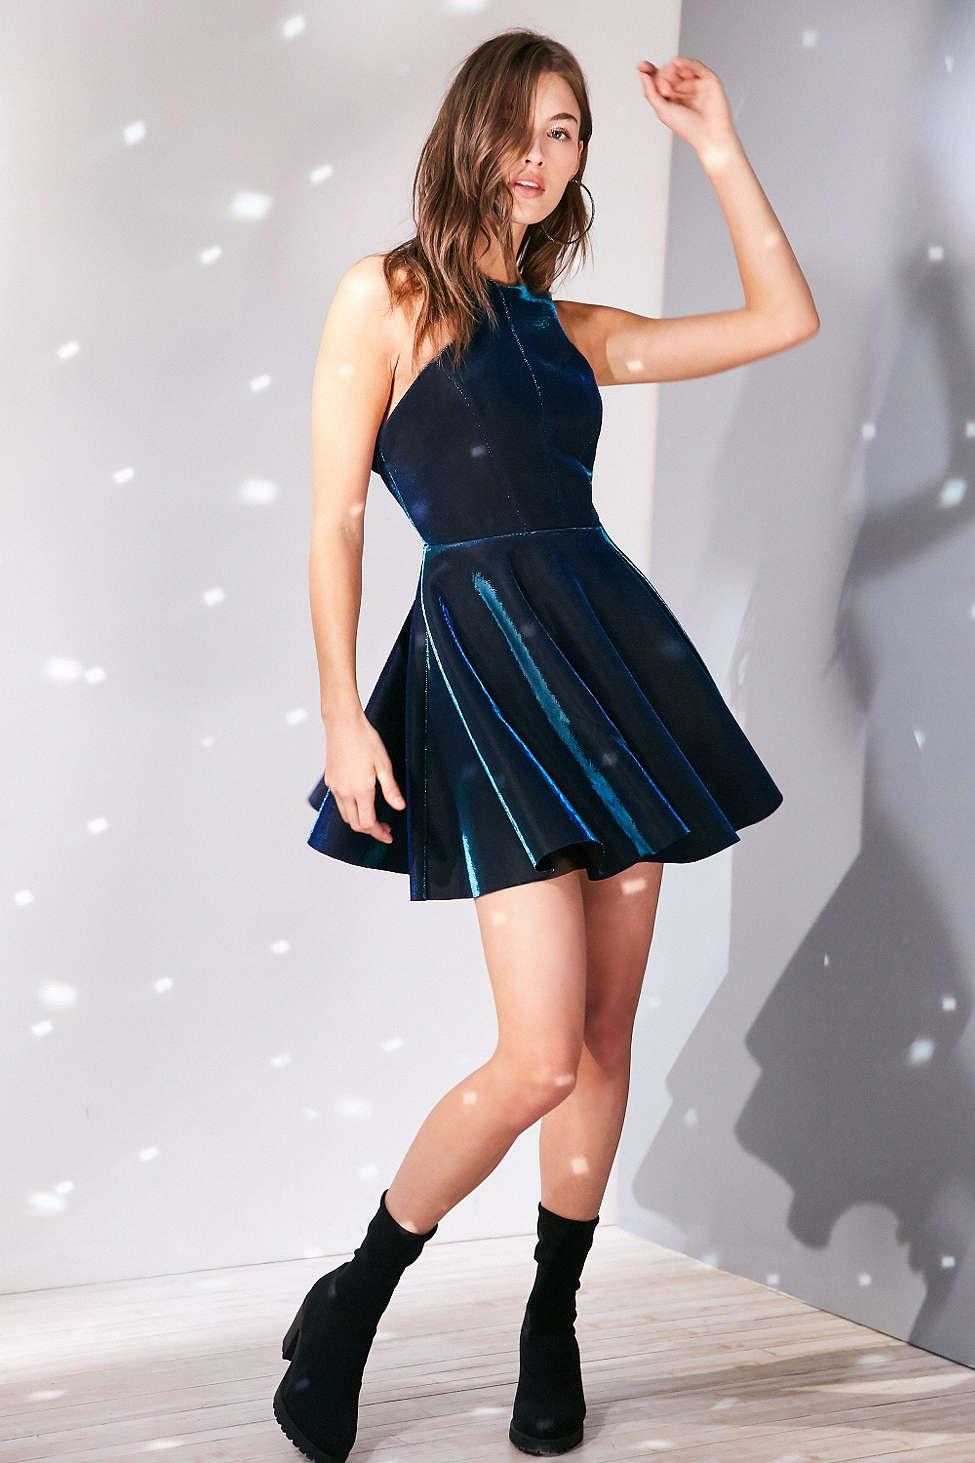 Silence + Noise Iridescent Carved High-Neck Mini Dress, $98